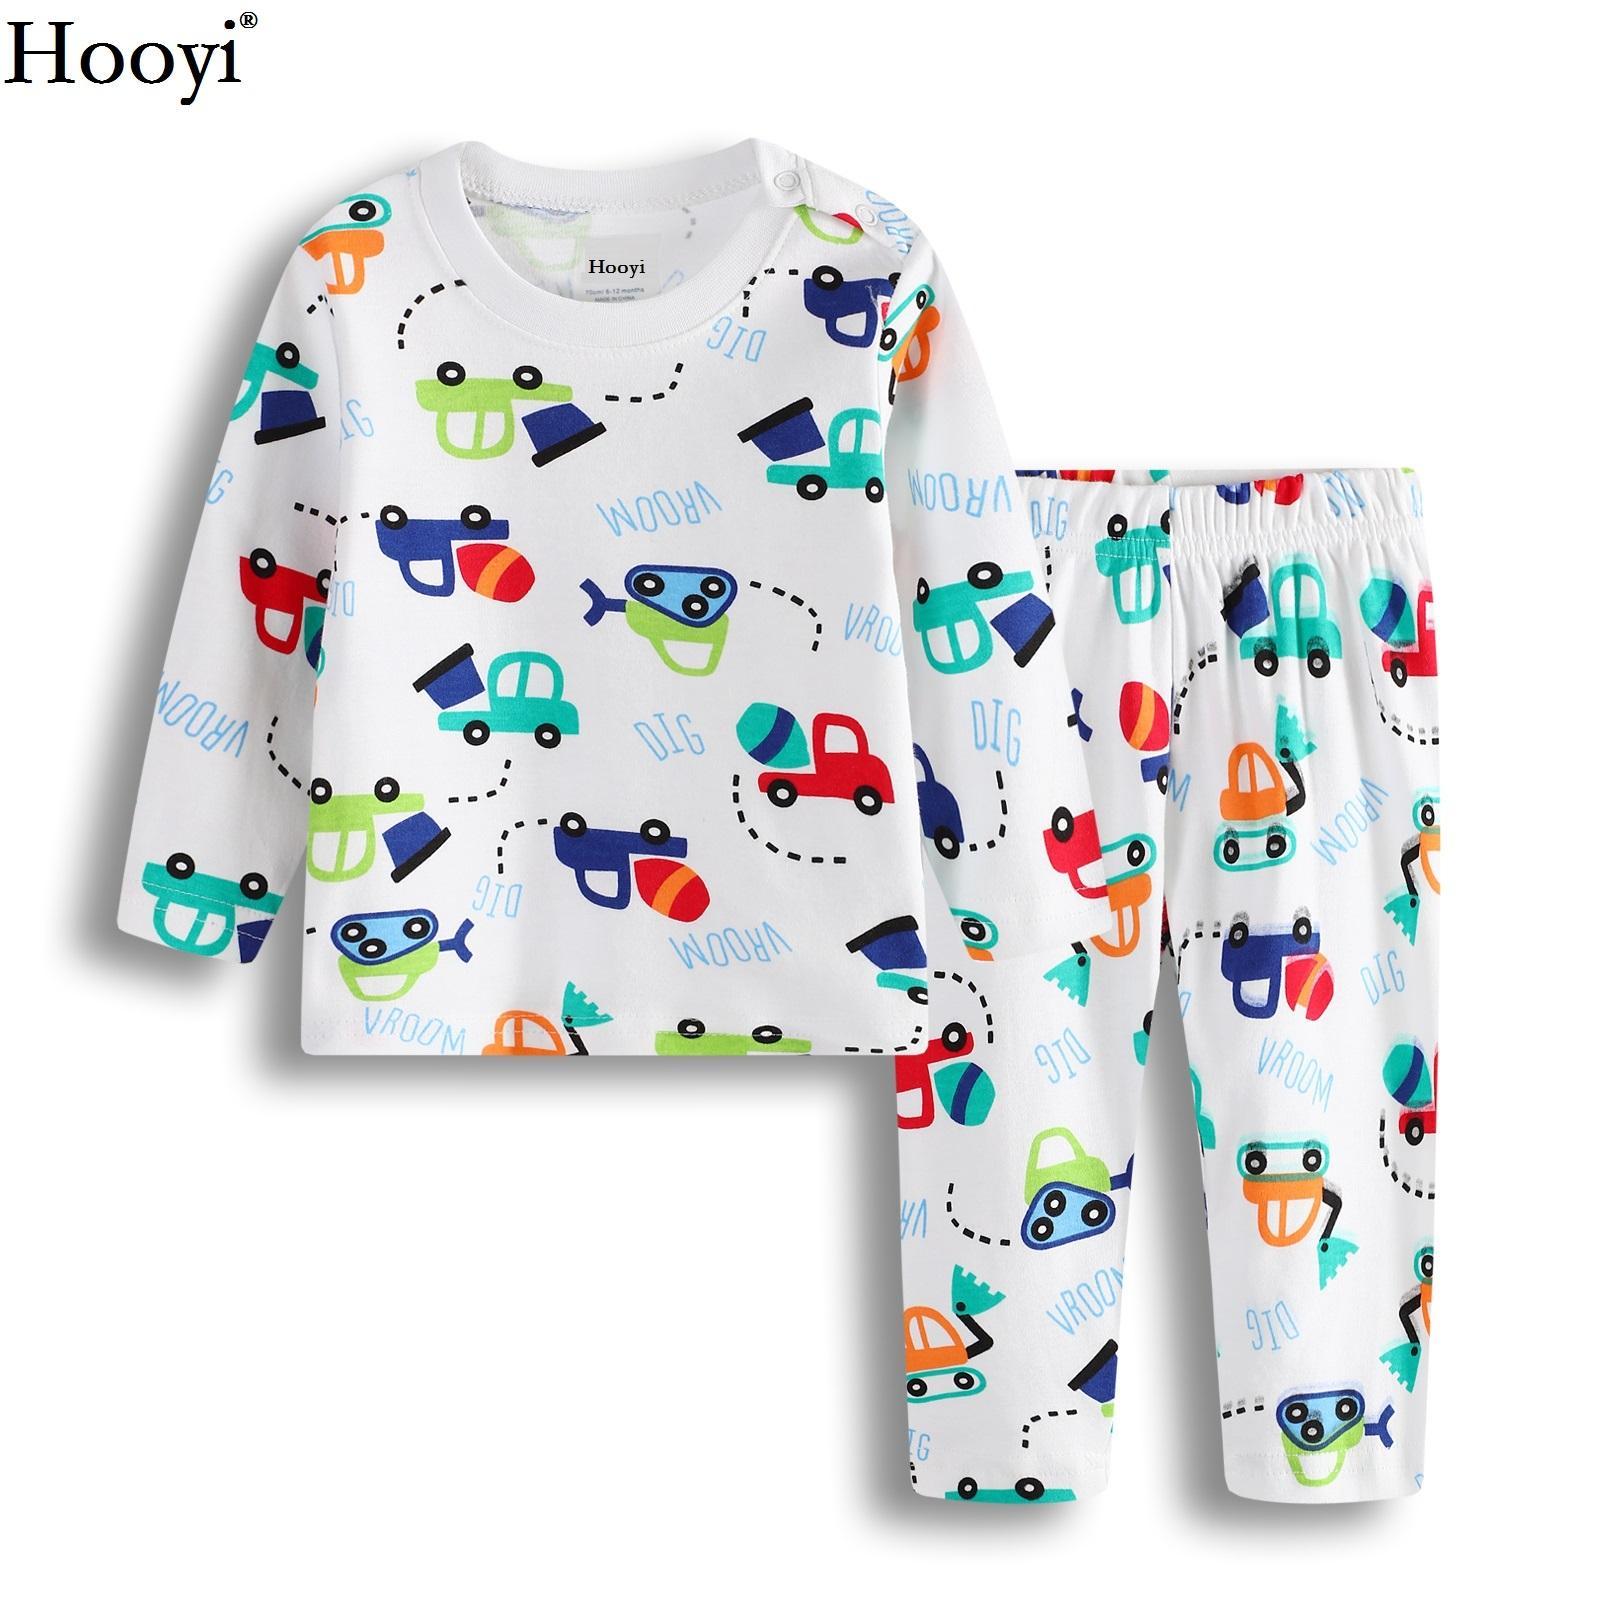 Hooyi Baby Boys Clothes Suit 100 Cotton Boys Pajamas Newborn